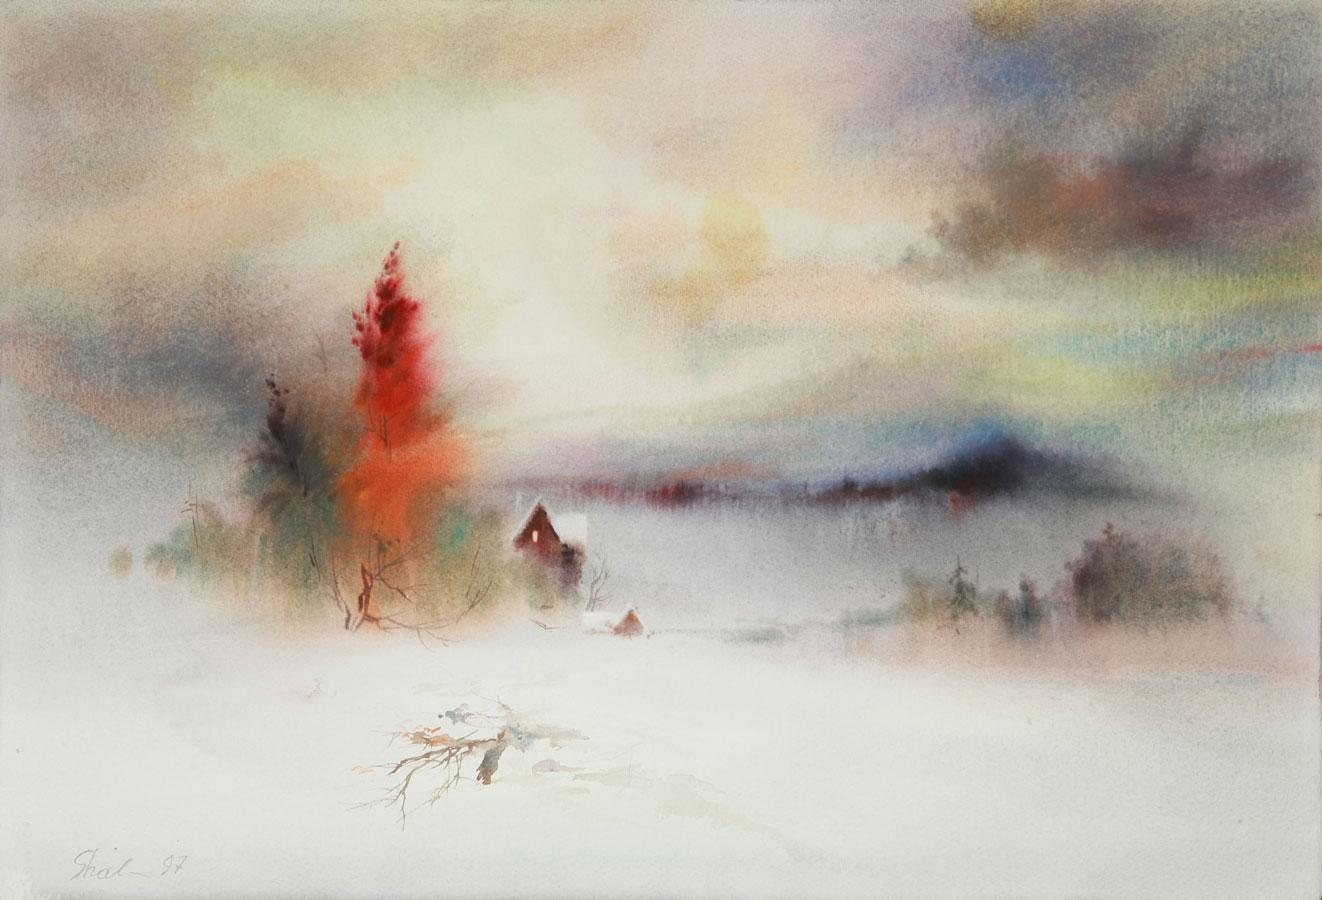 watercolor paintings wet-on-wet winter landscape fine art aquarelle artist Shalum Shalumov Шалум Шалуиов архитектор художник архитектурный дизайнер